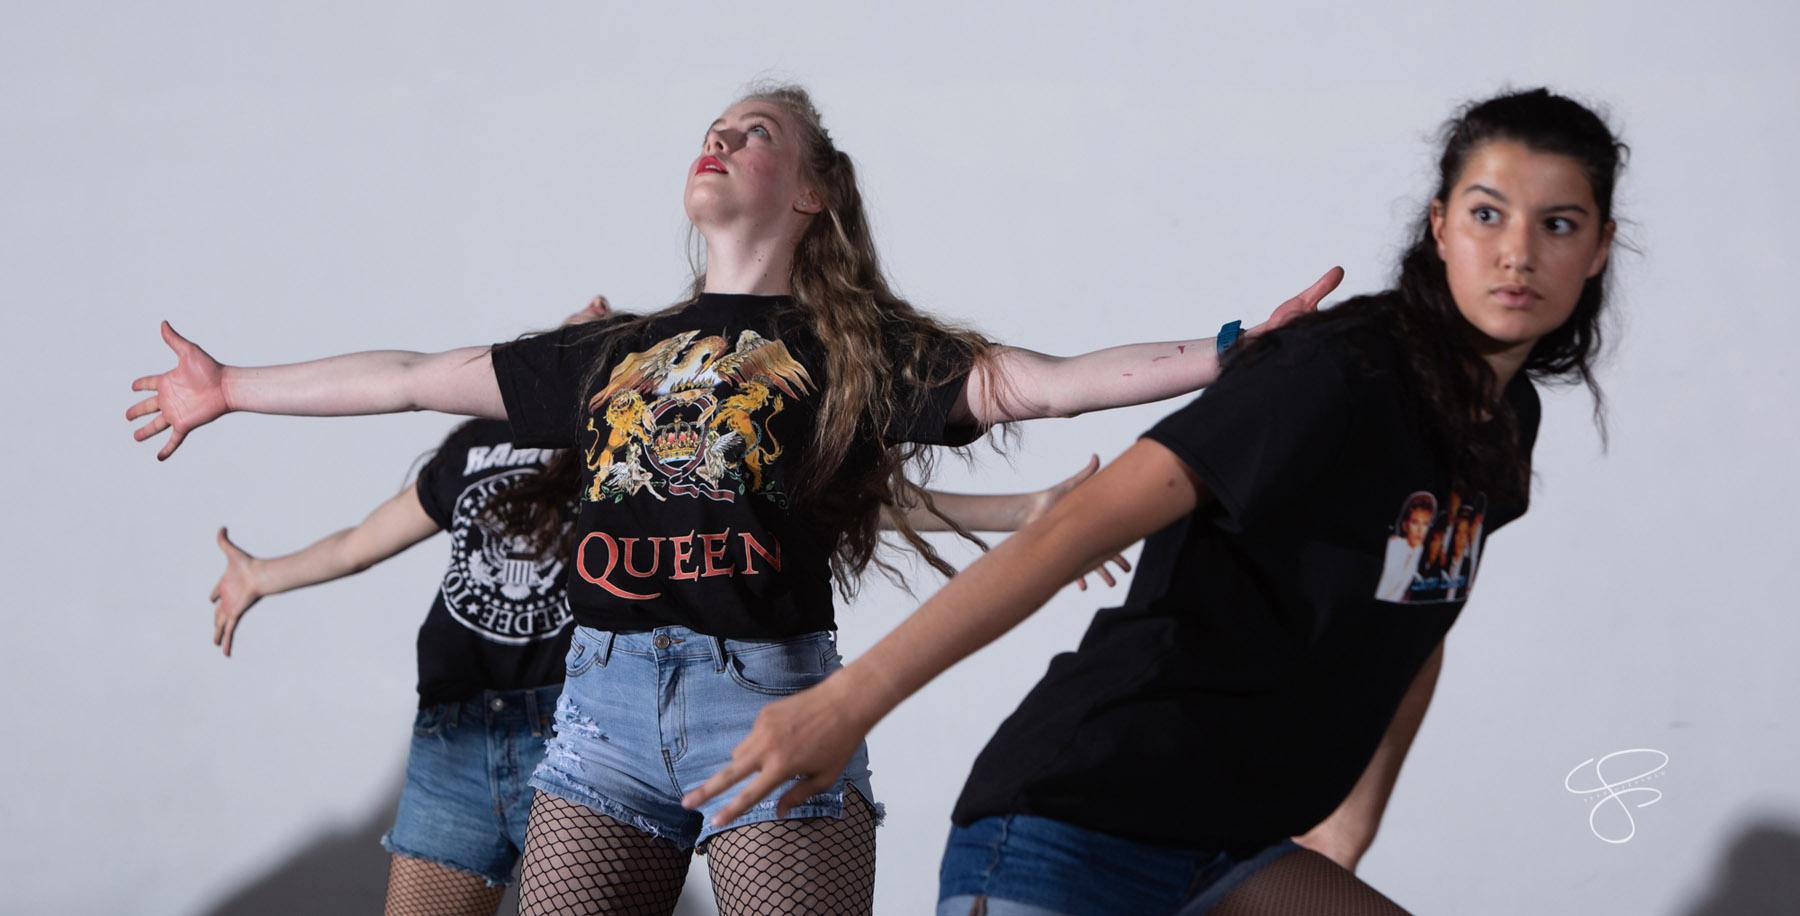 2019 NPA Rock through the Ages - Spring show